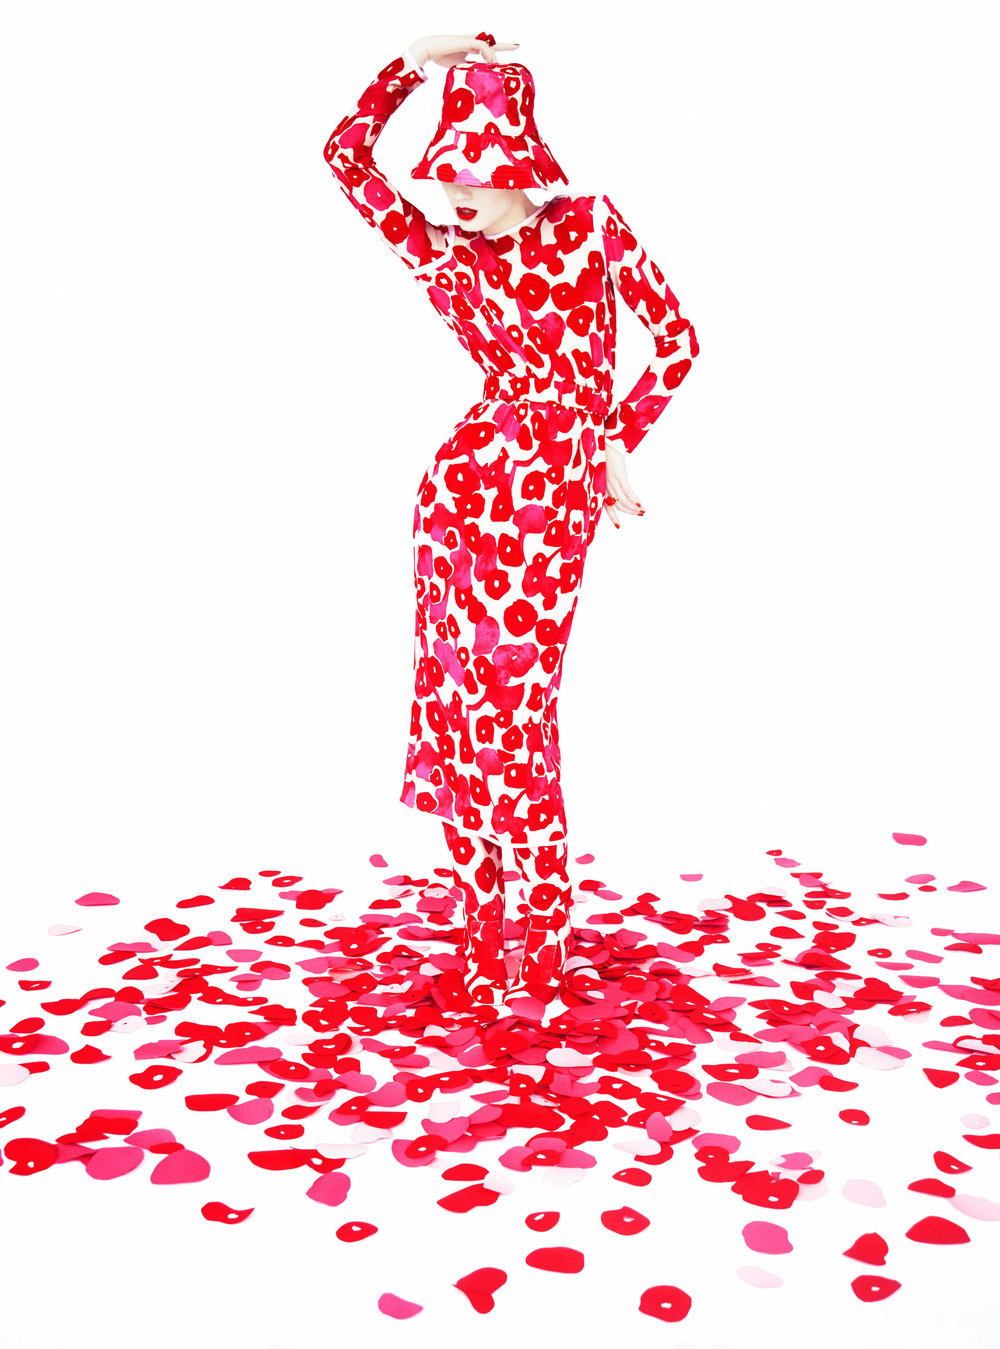 Erik Madigan Heck.   Florals, Harper's Bazaar UK, 2015.  ©Erik Madigan Heck/Courtesy Staley-Wise Gallery, New York